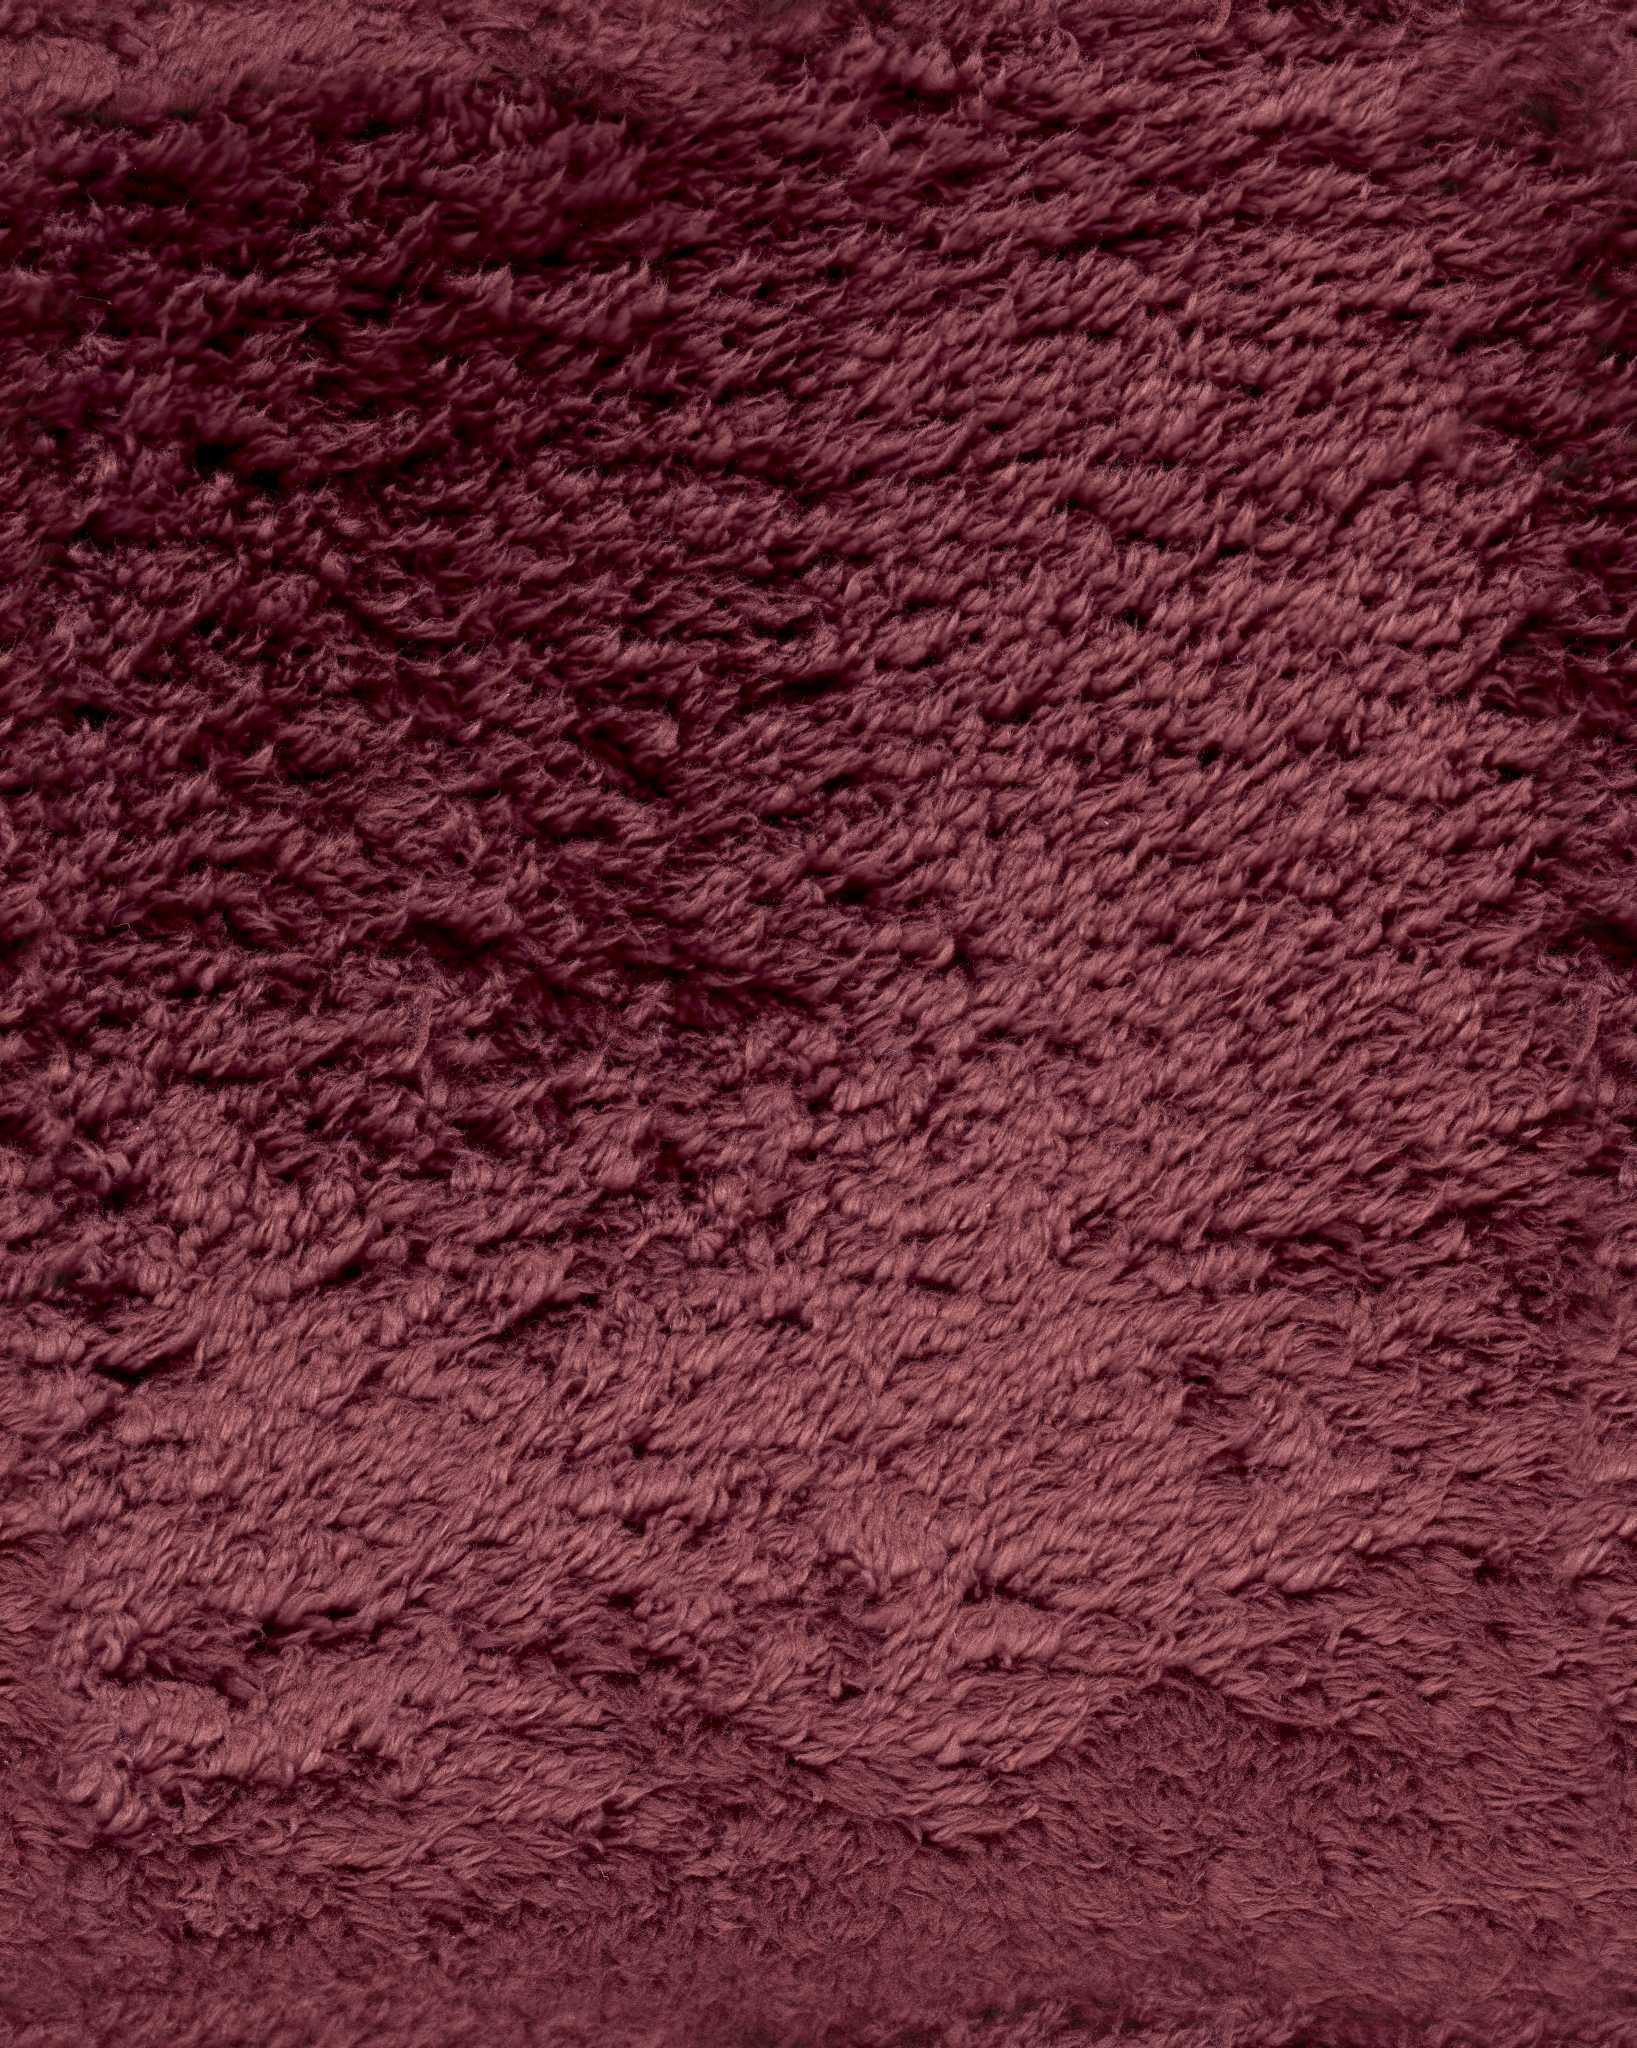 carpet texture pattern redcarpetirregular_s.jpg ... QJFDEGM